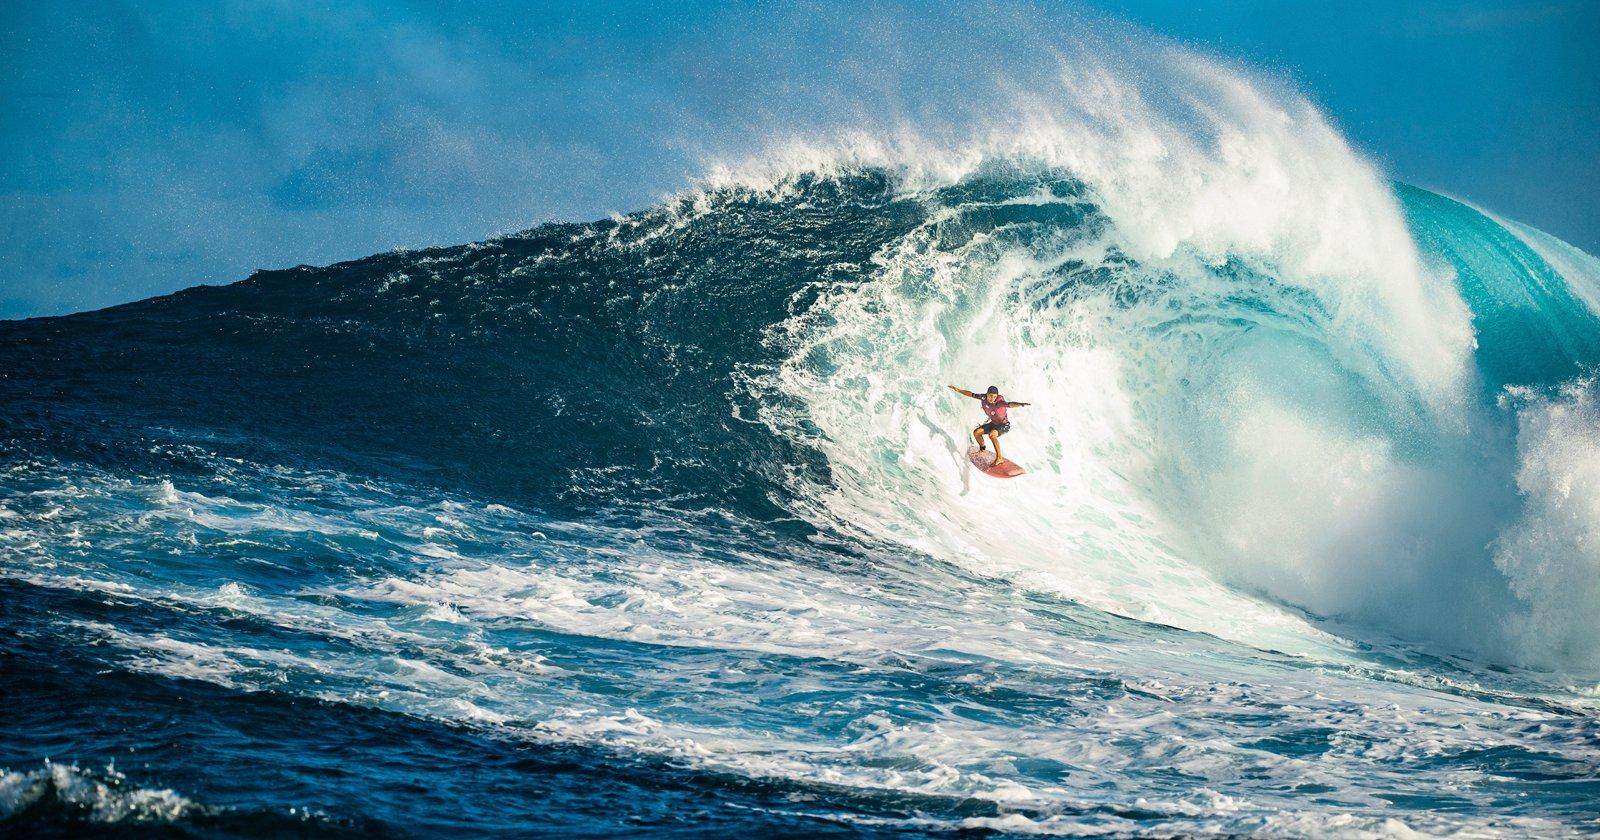 Red Bull Showcases Women Photographers Capturing Hawaii's Big Wave Season